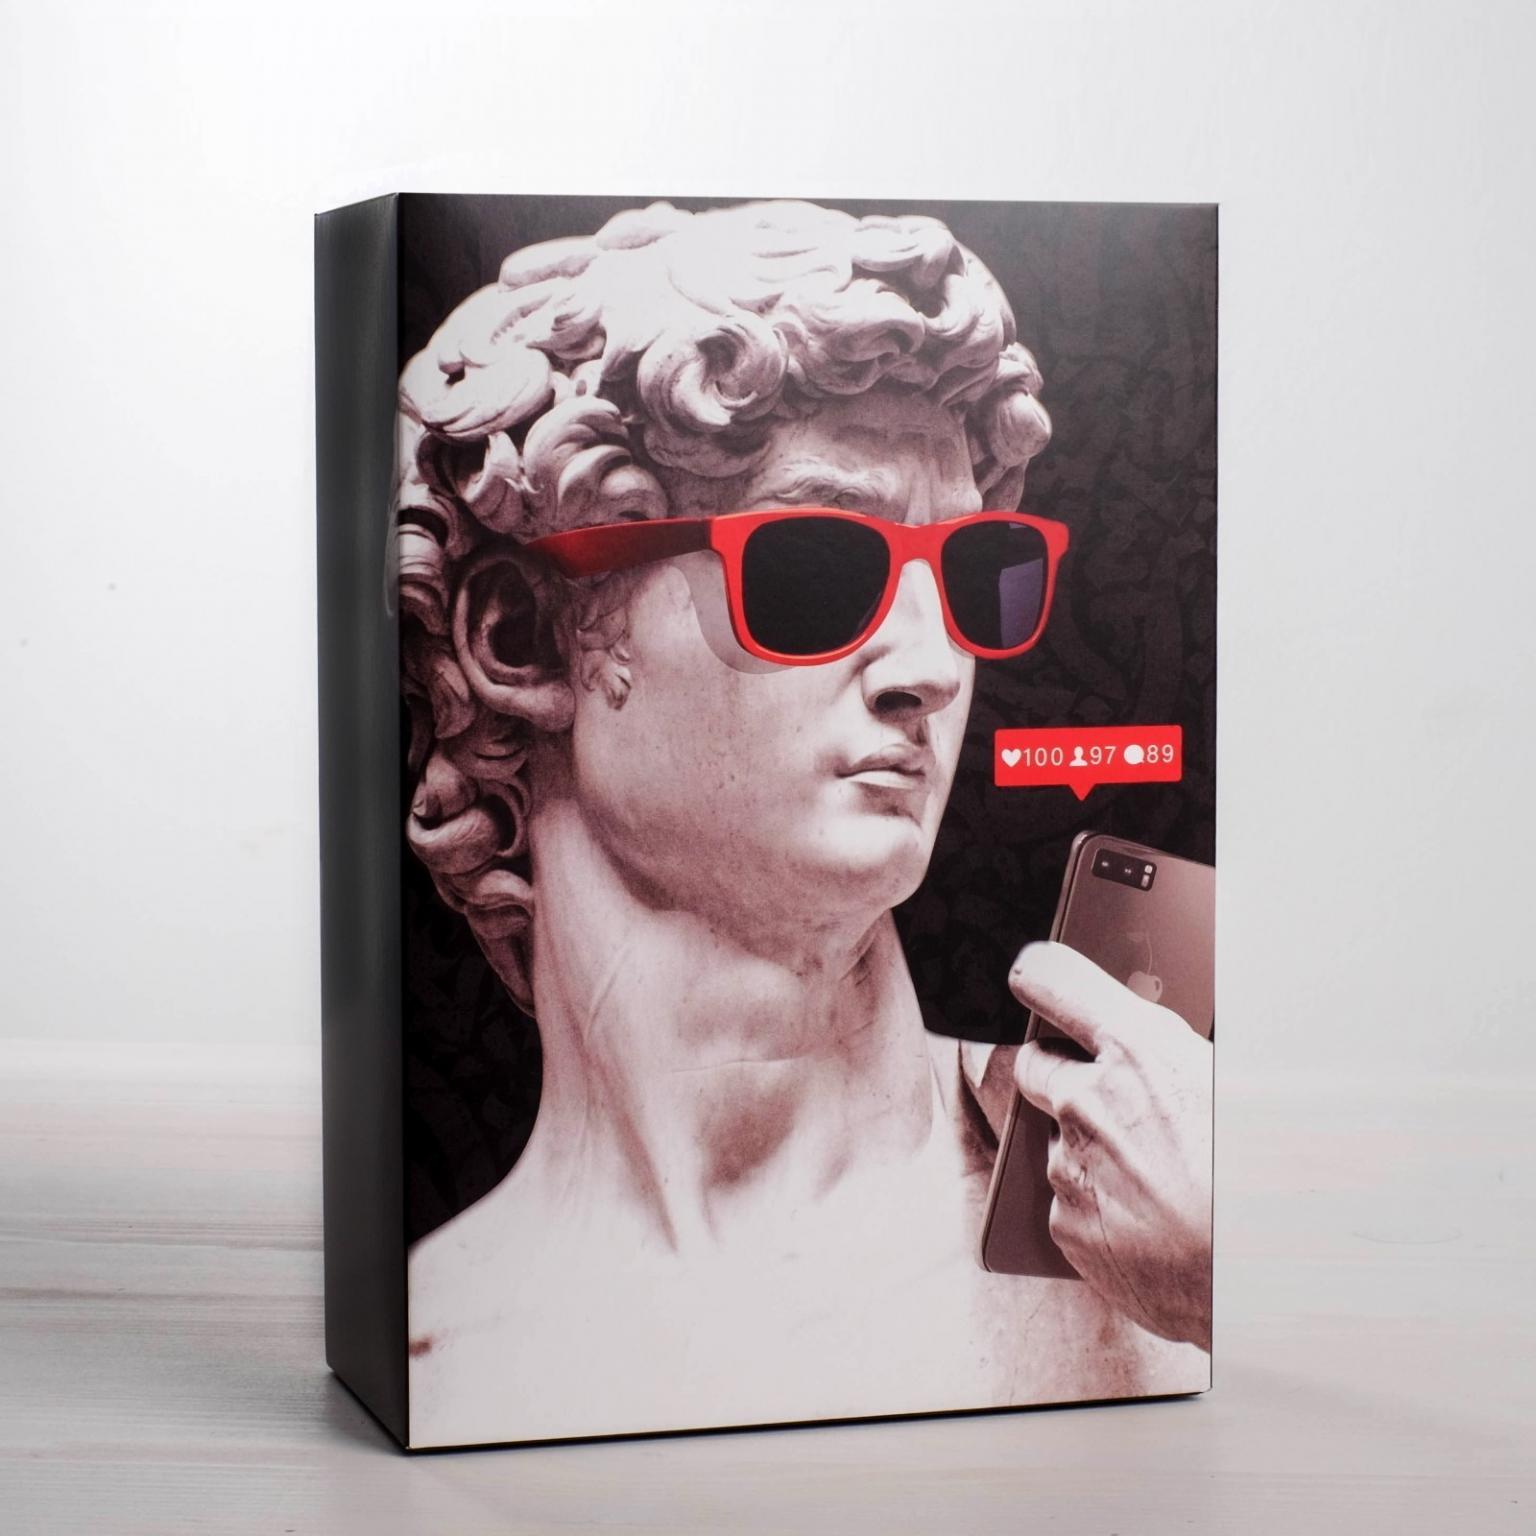 Коробка складная «Скульптуры», 16  23  7.5 см